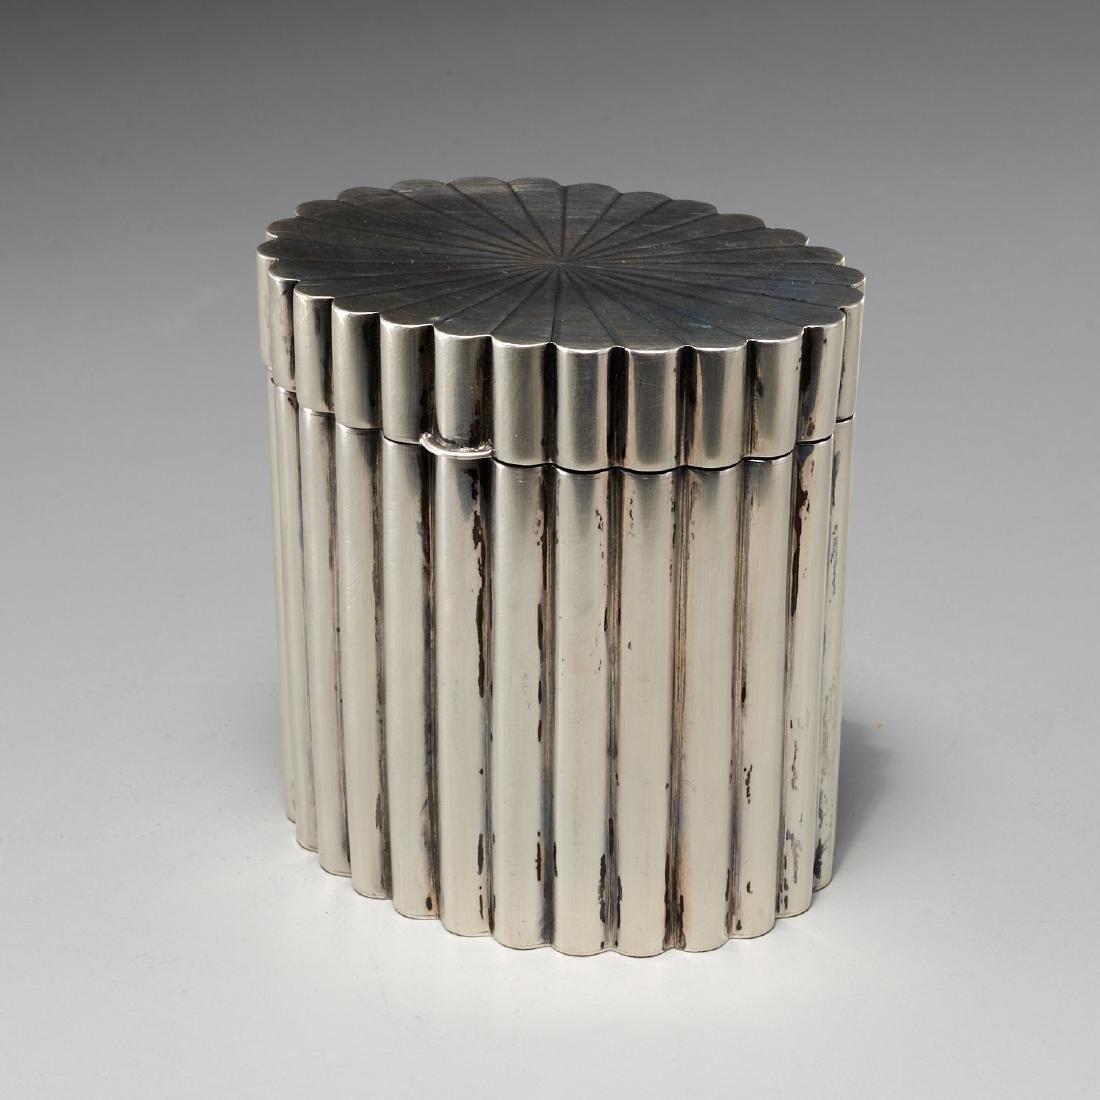 Tiffany & Co. Art Deco silver lidded box